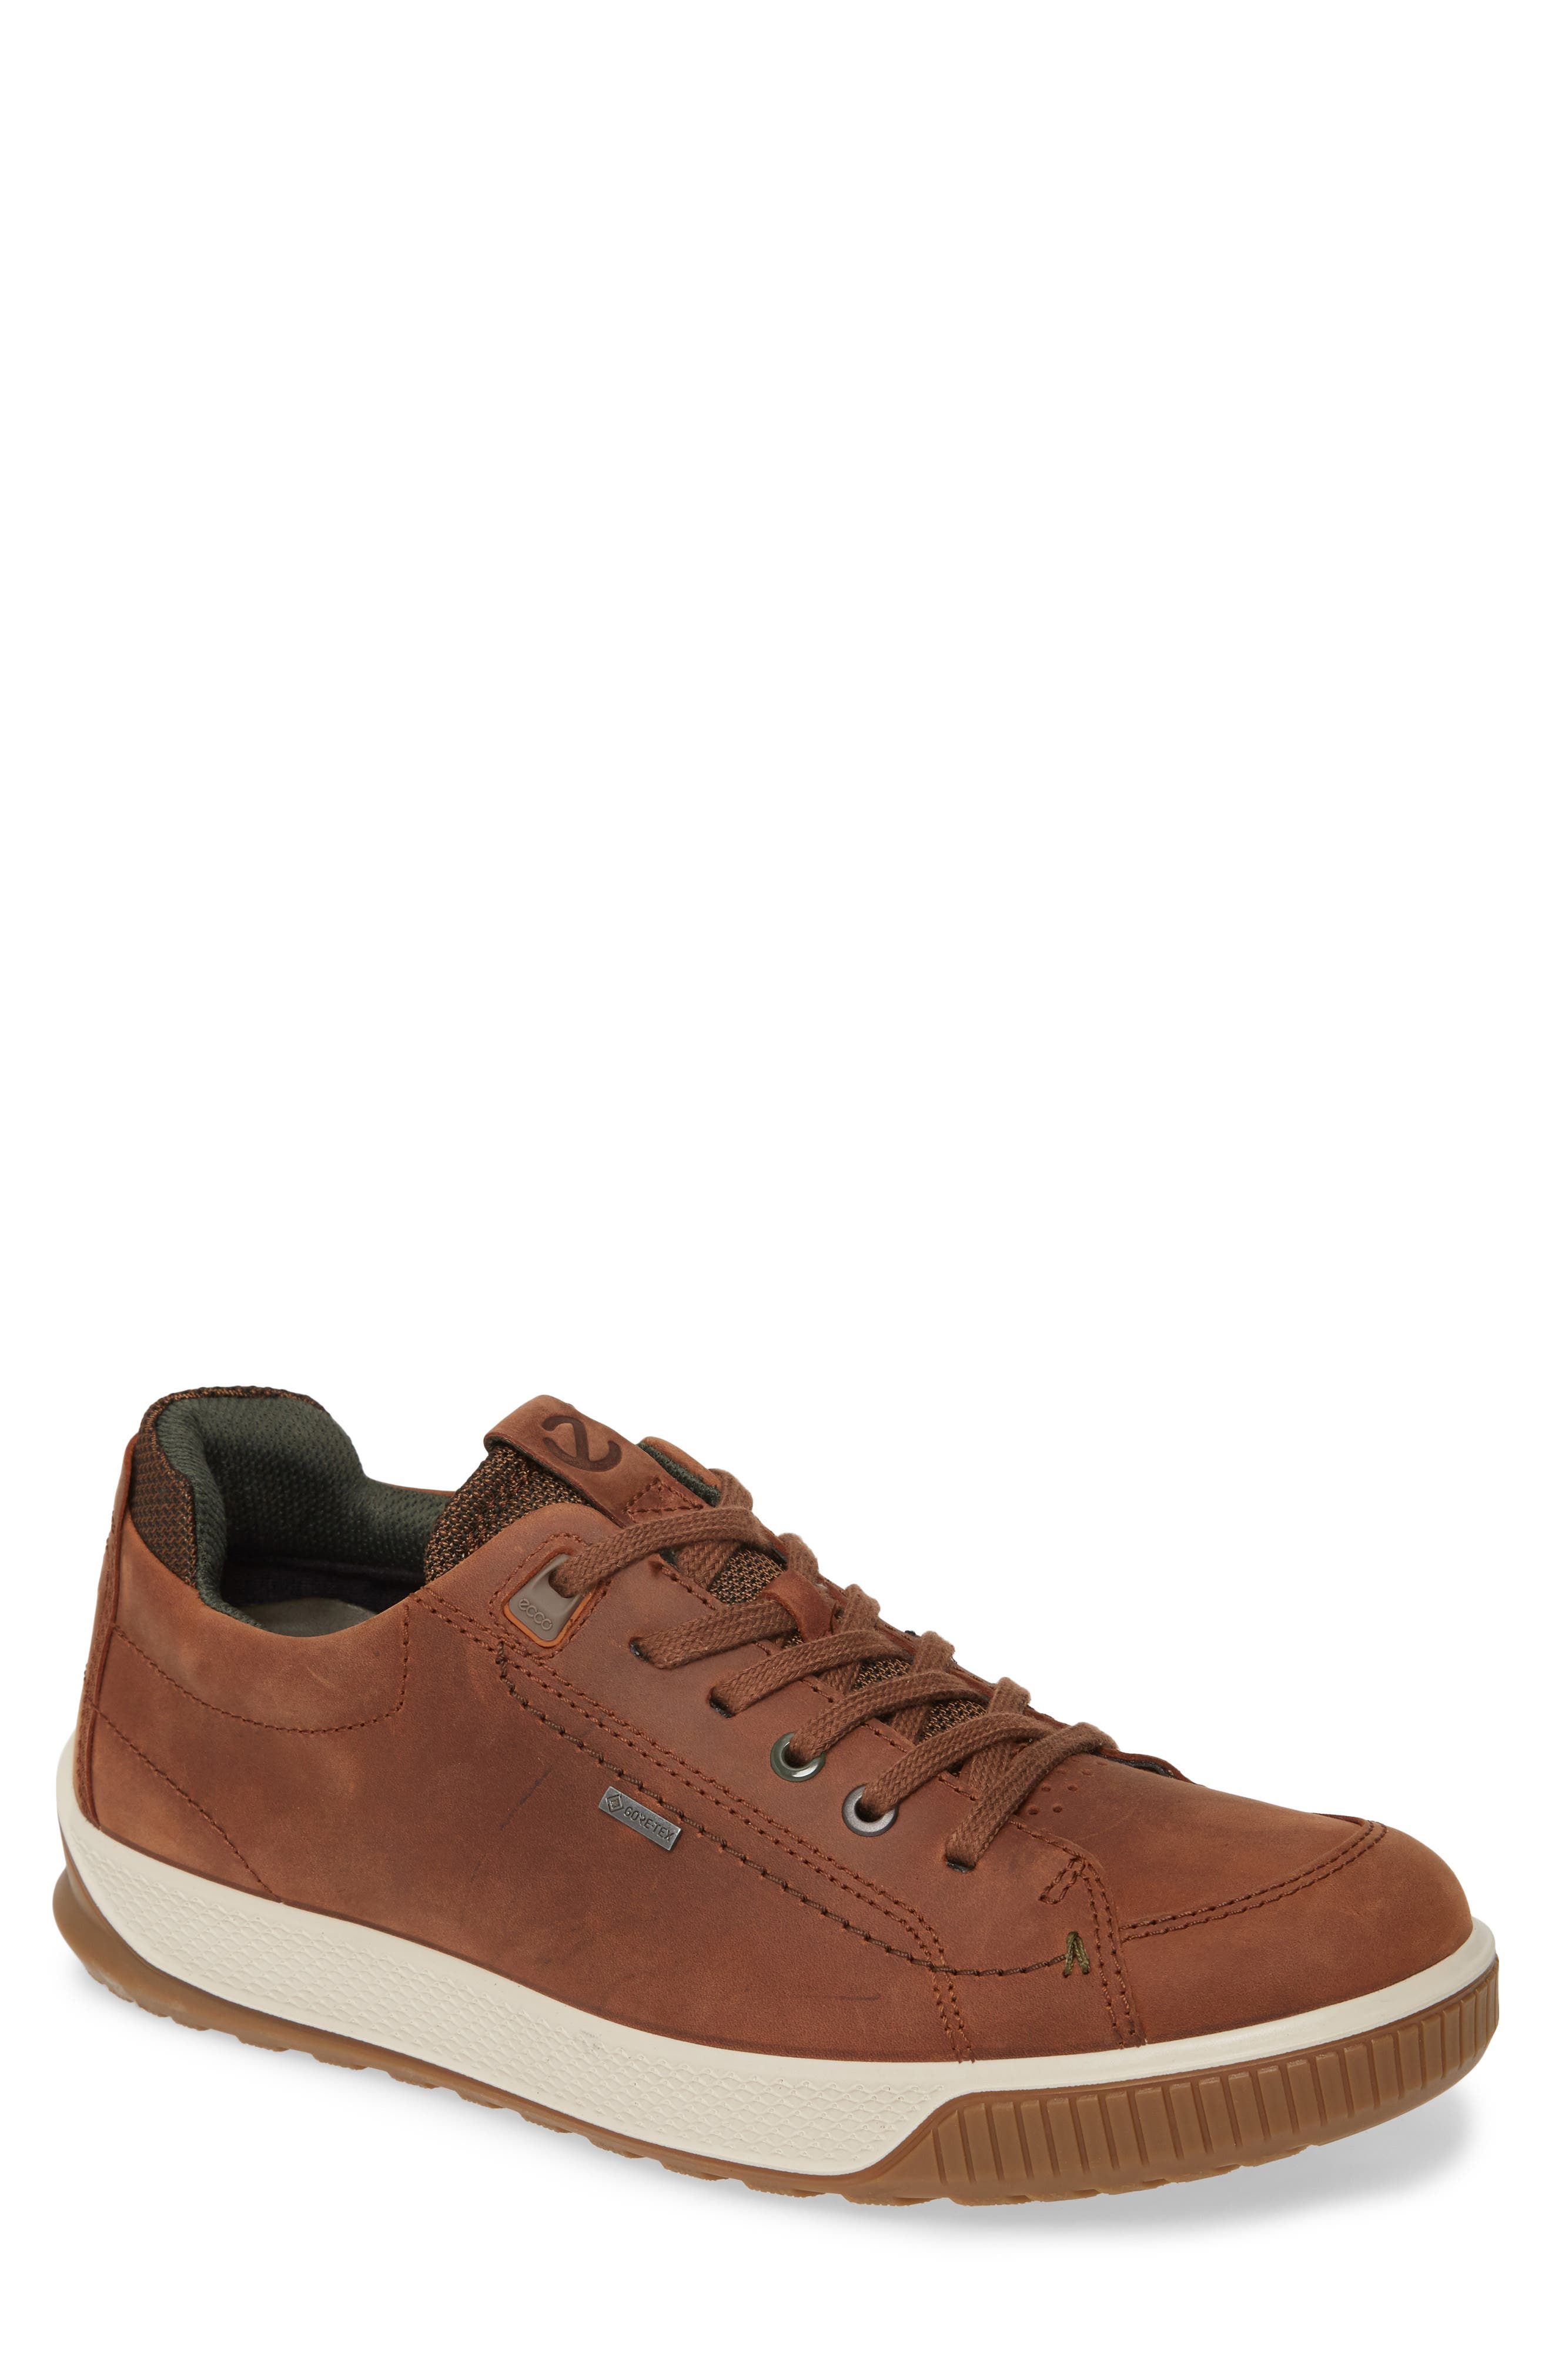 ECCO Mens Byway Low-Top Sneakers